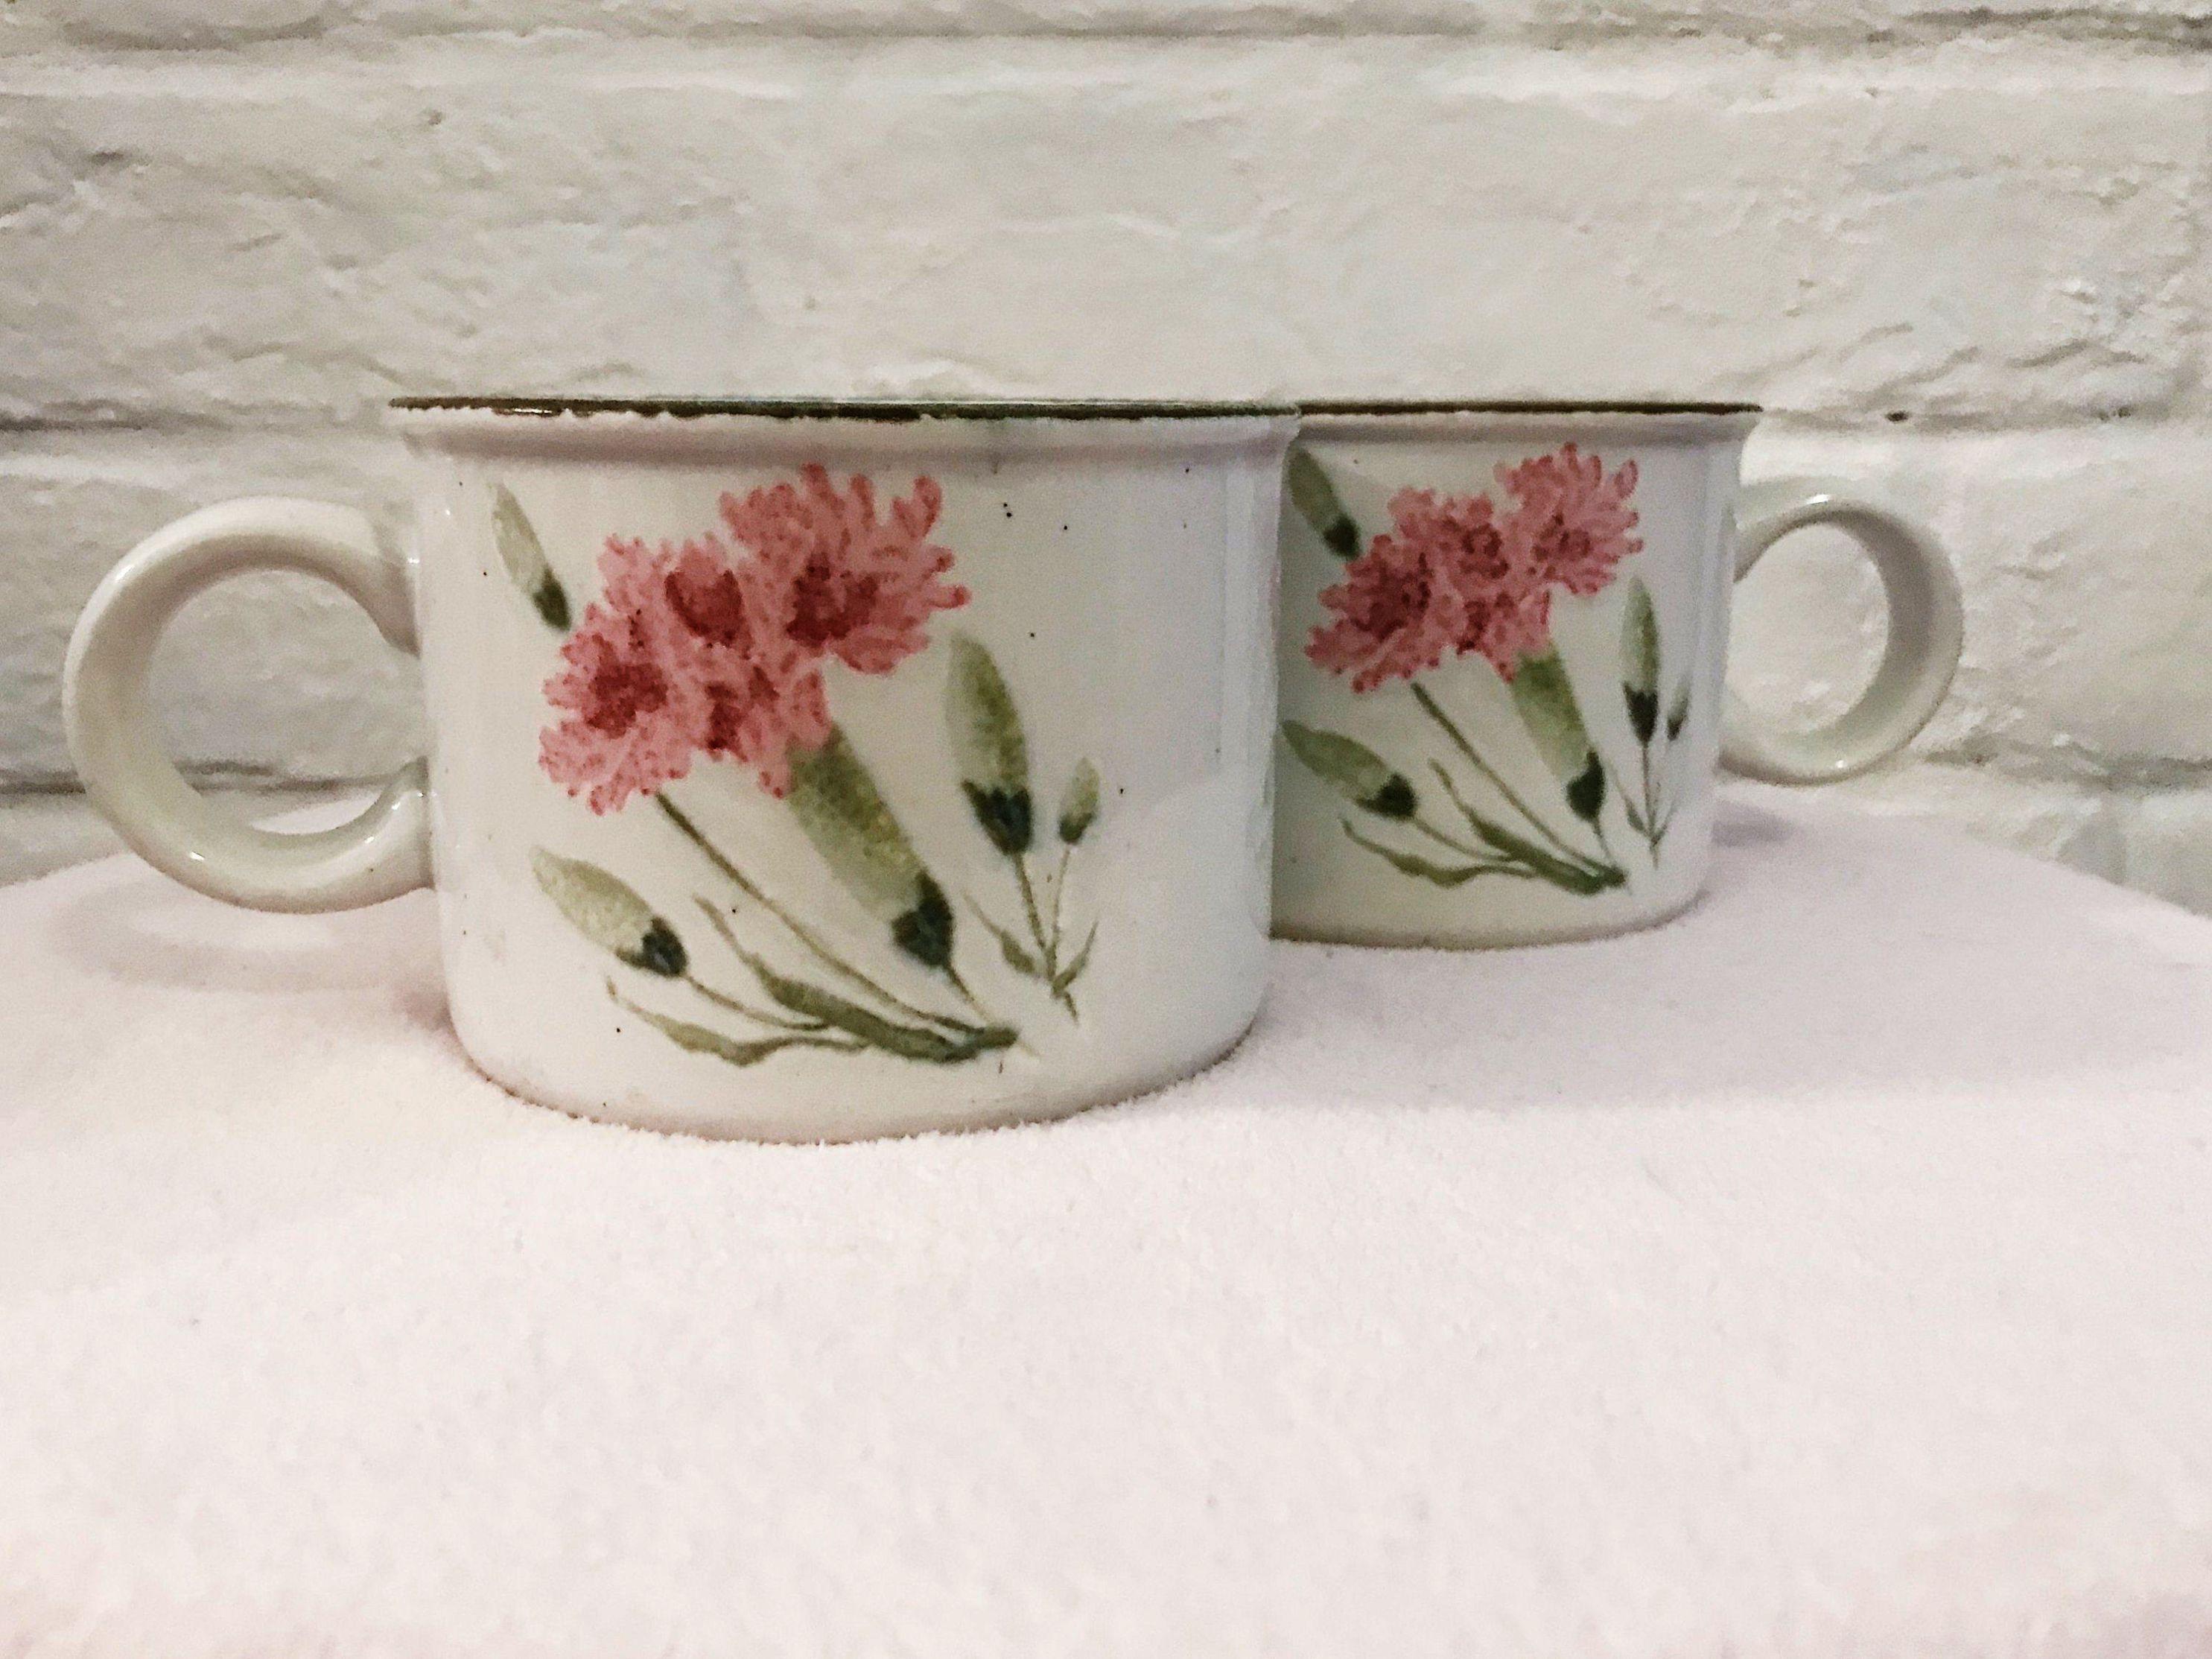 Coffee Los Angeles Up Coffee Near Me Asheville Nc Vintage Coffee Cups Vintage Coffee Flower Tea